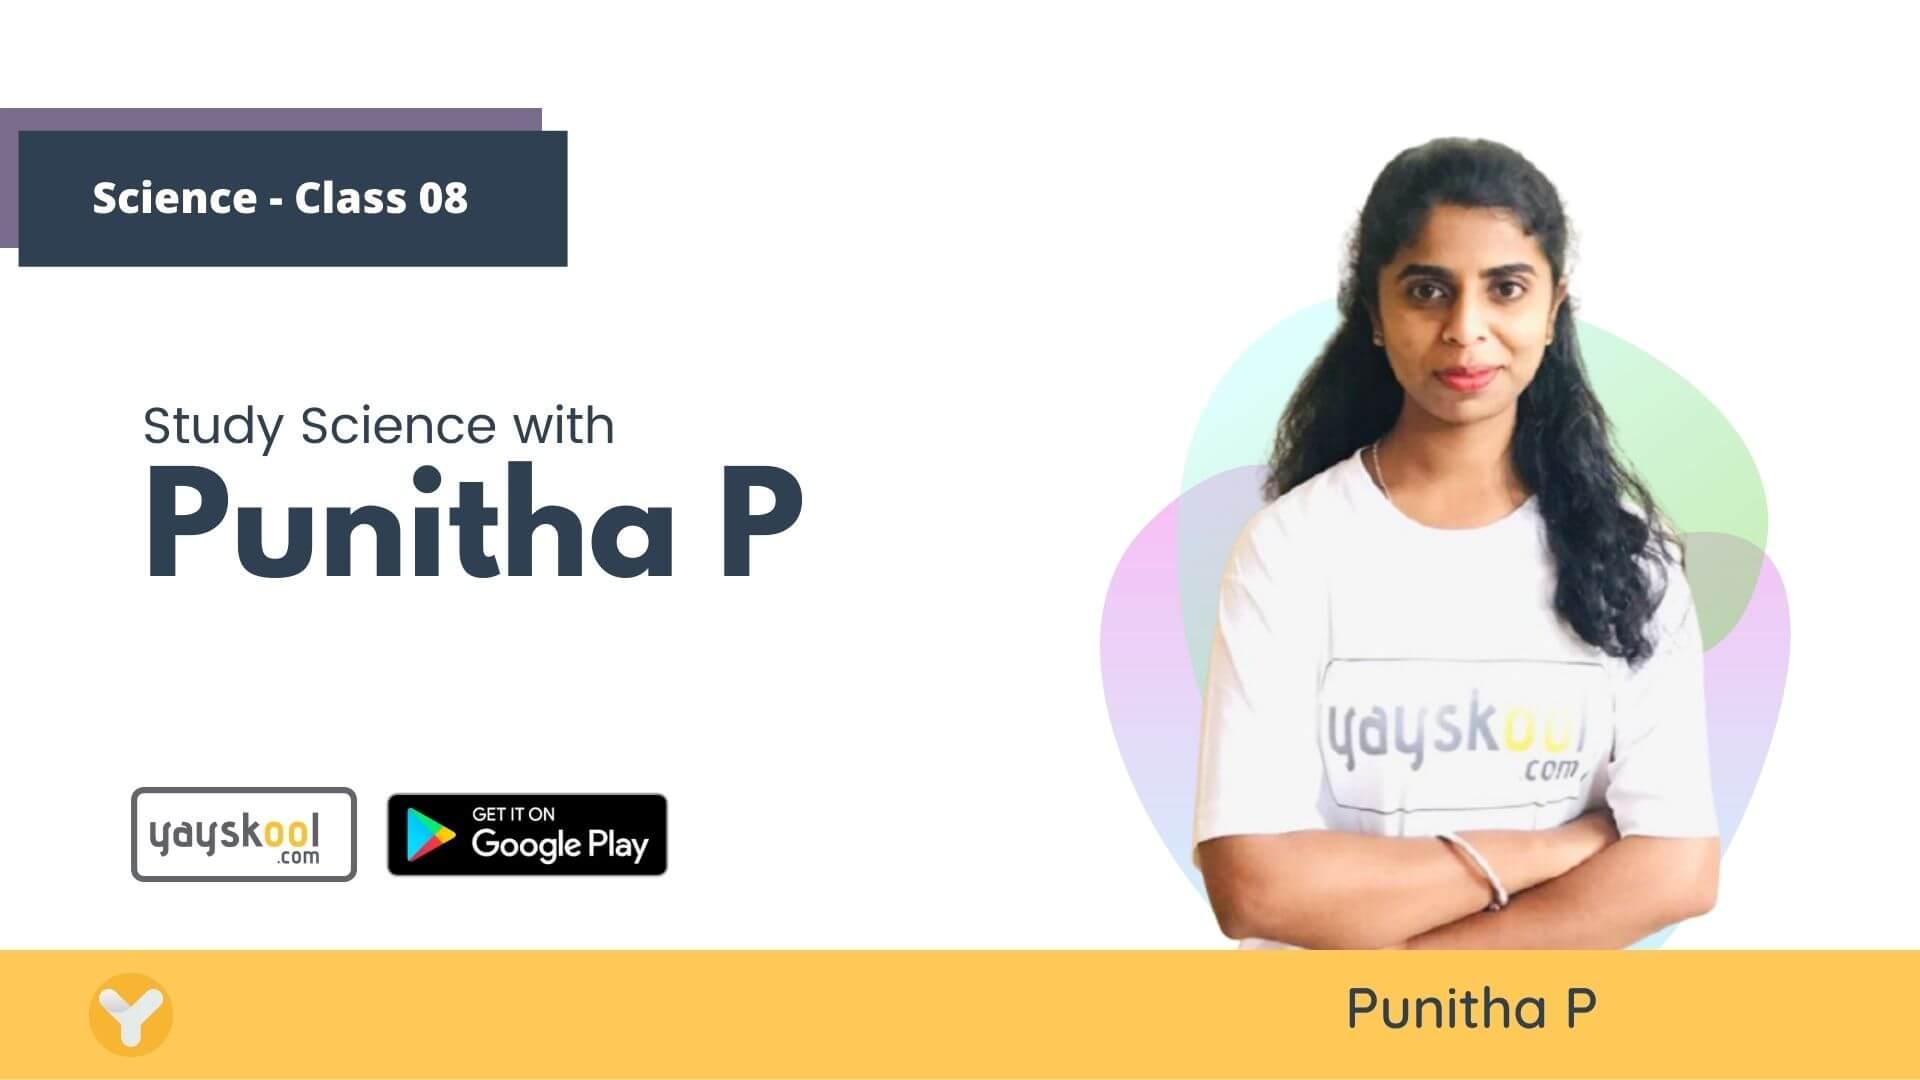 science-course-class08-punitha-p